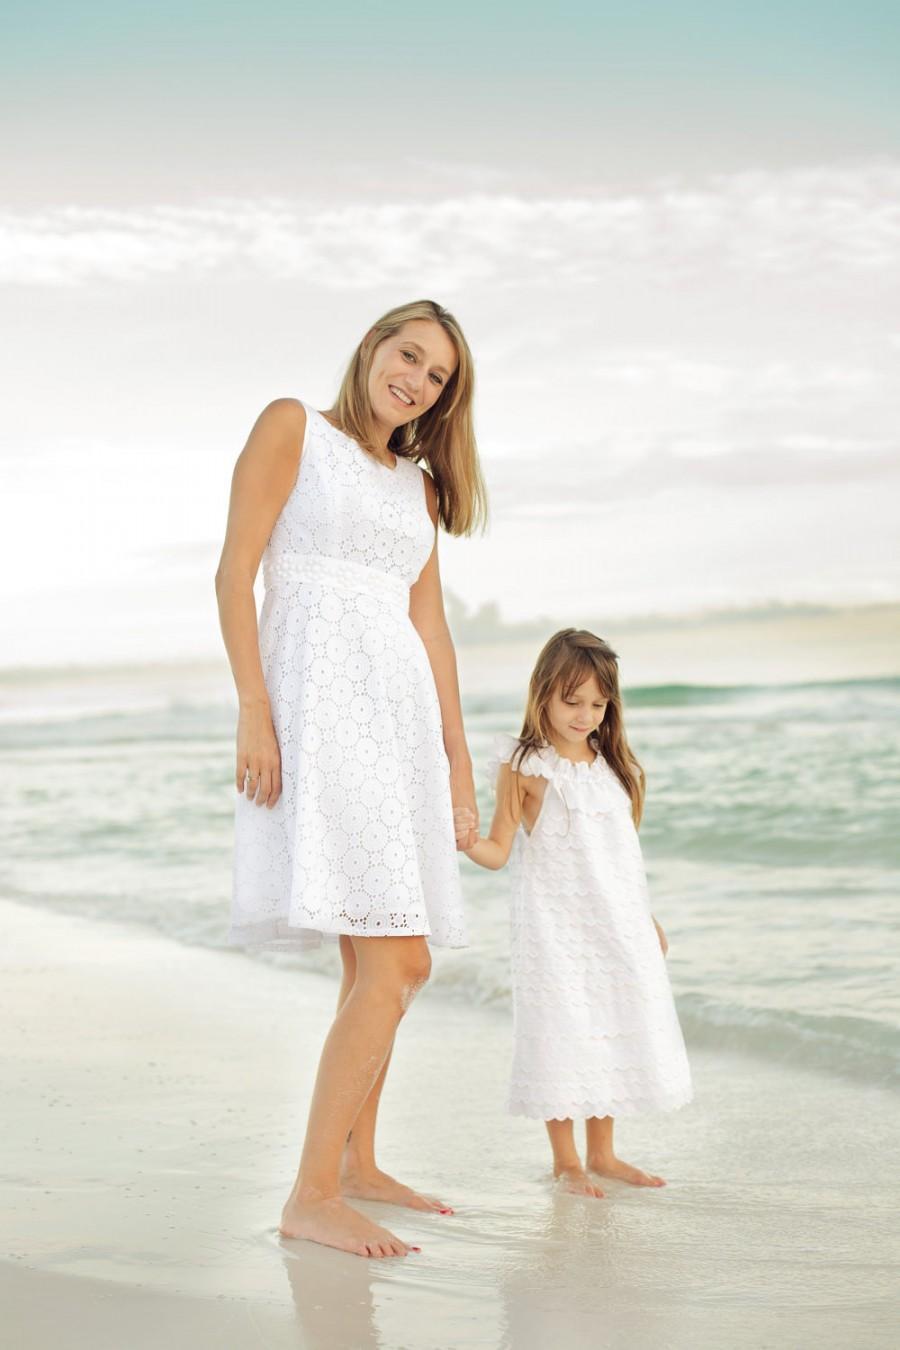 Infant Baby Flower Girl Peasant Pillowcase Dress Wedding Beach Portrait Photo White Layers Eyelet Lace Neck Ruffle Sizes 3 6 9 12 18 24 Mo